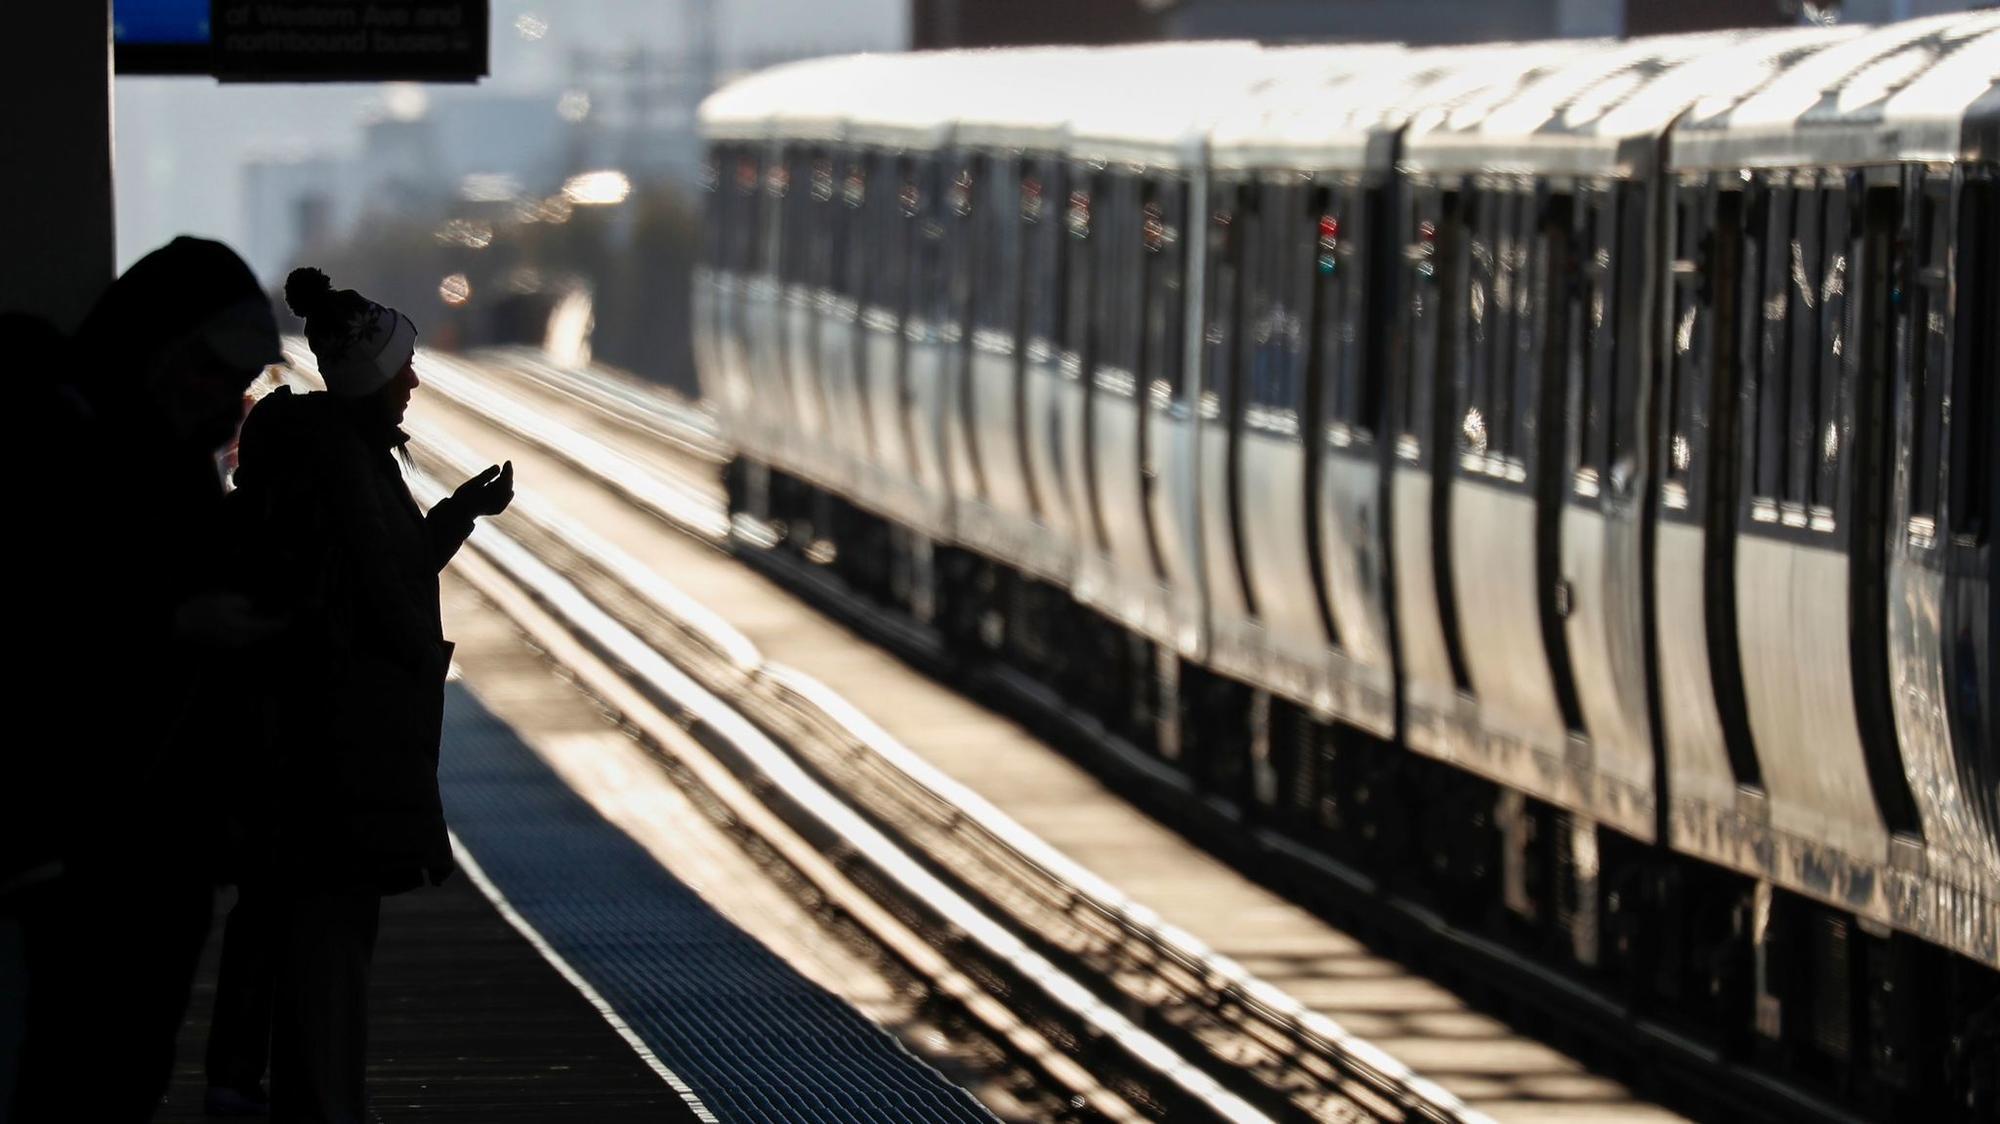 Cta Train Operators Others Would Get Raises Under Deal Between